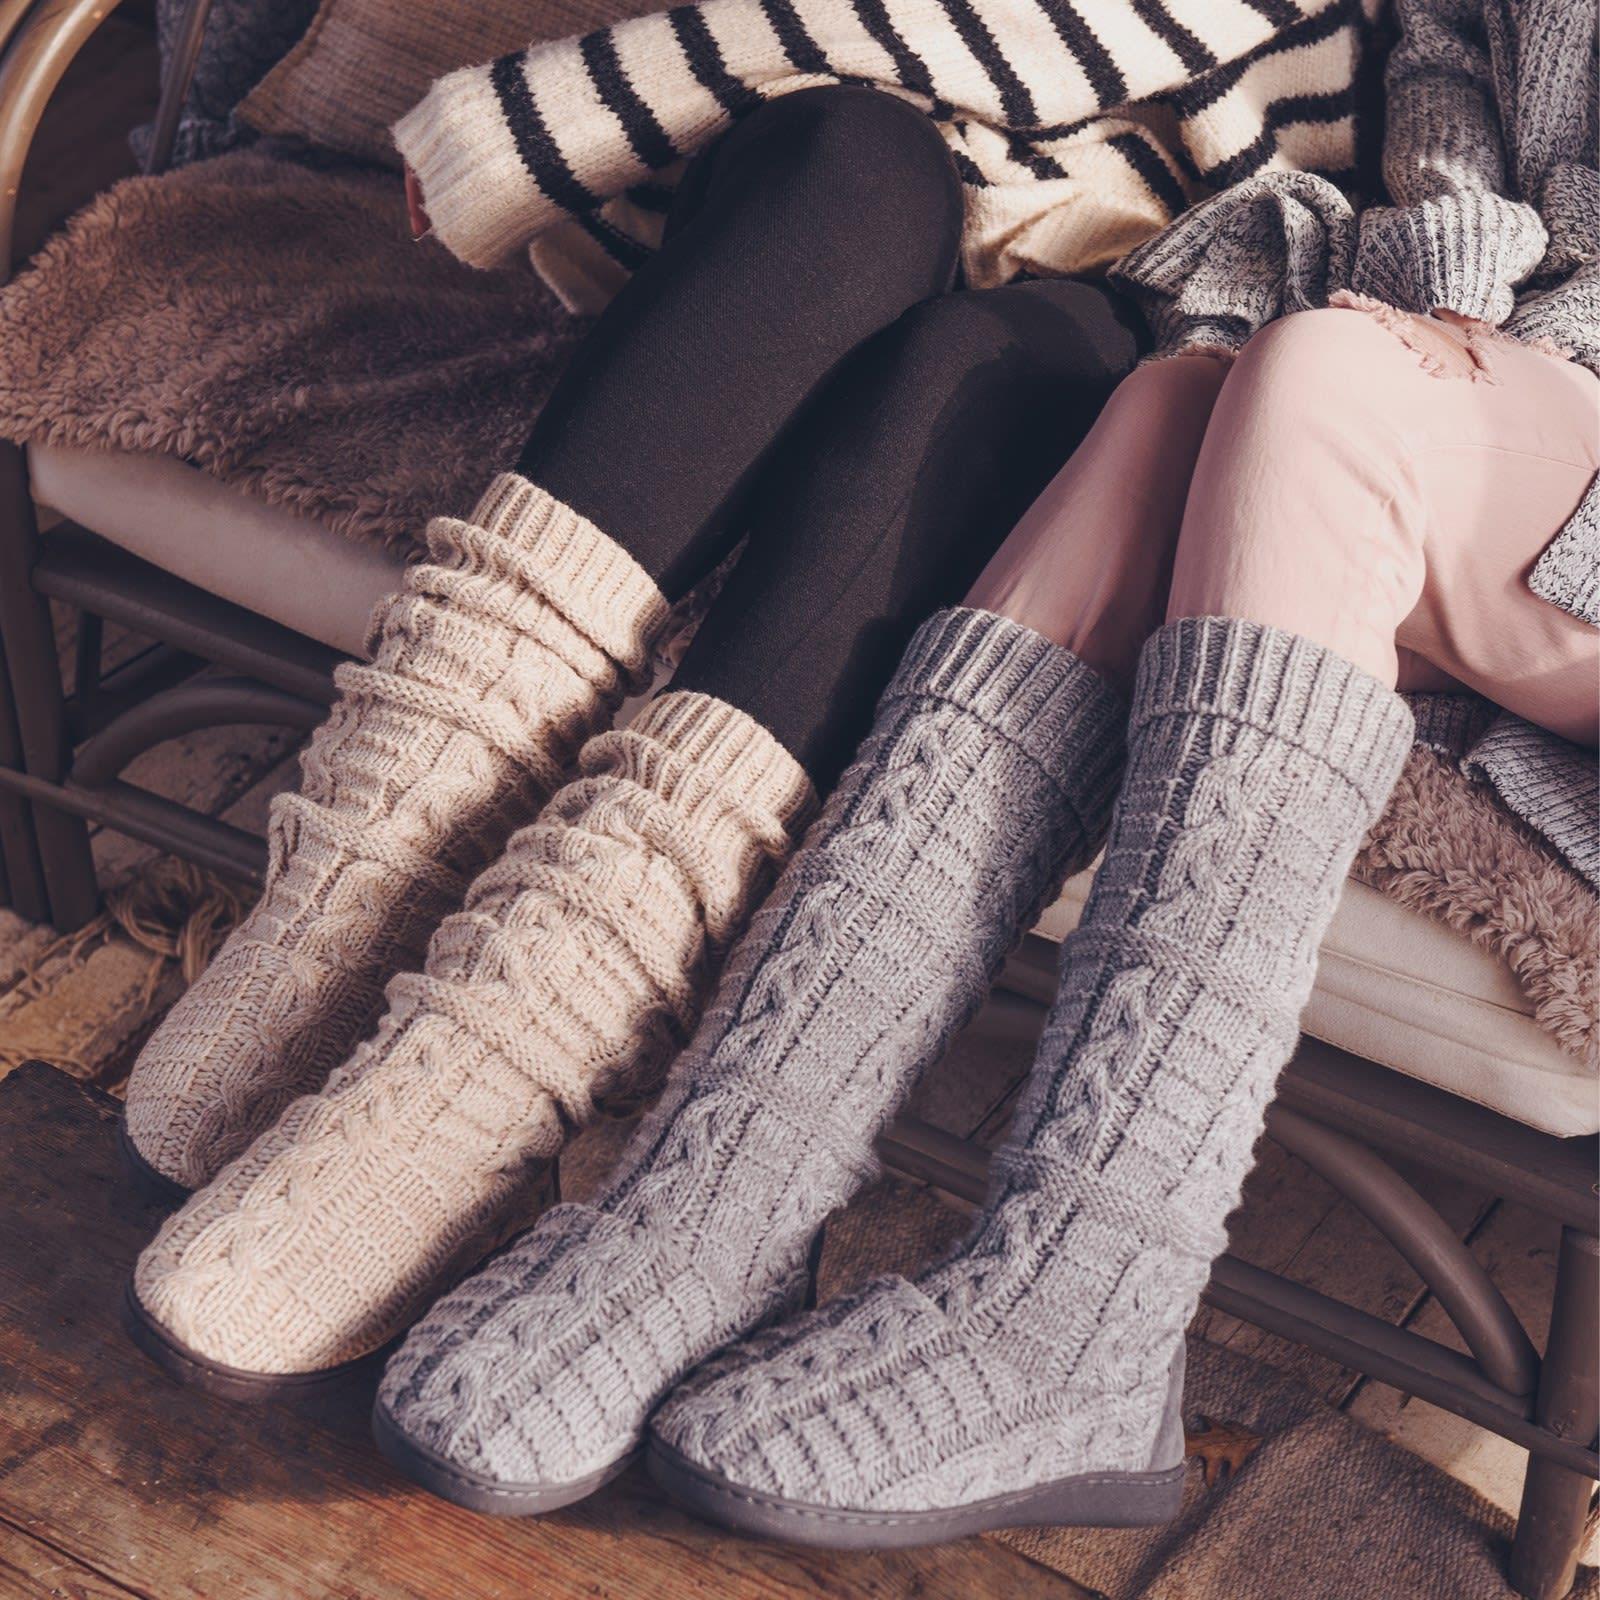 fd067e4f516 MUK LUKS Women s Shelly Slippers only  17.99 shipped (Reg.  45 ...